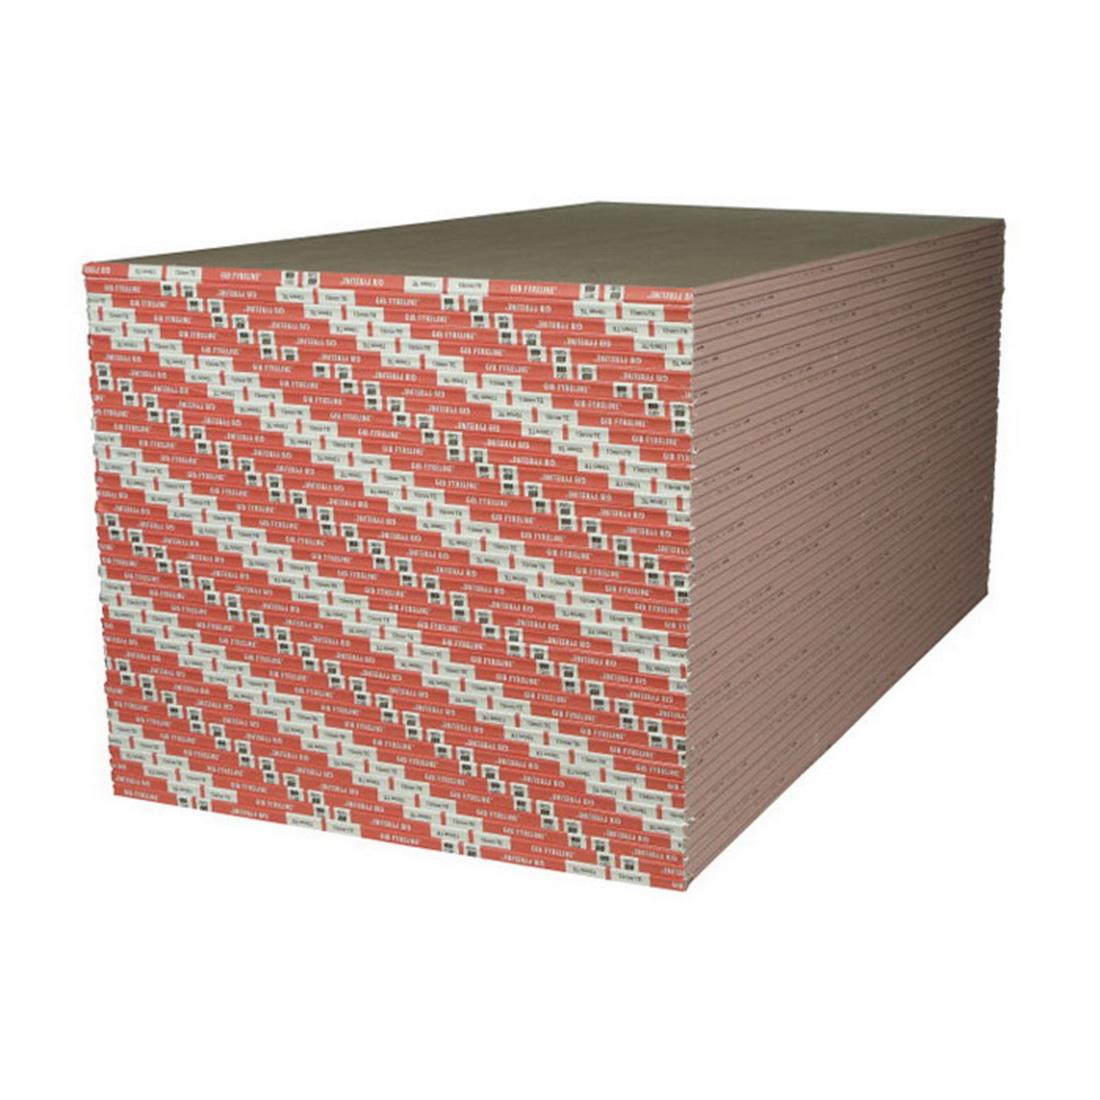 Fyreline Plasterboard 2400 x 1200 x 13mm 11681